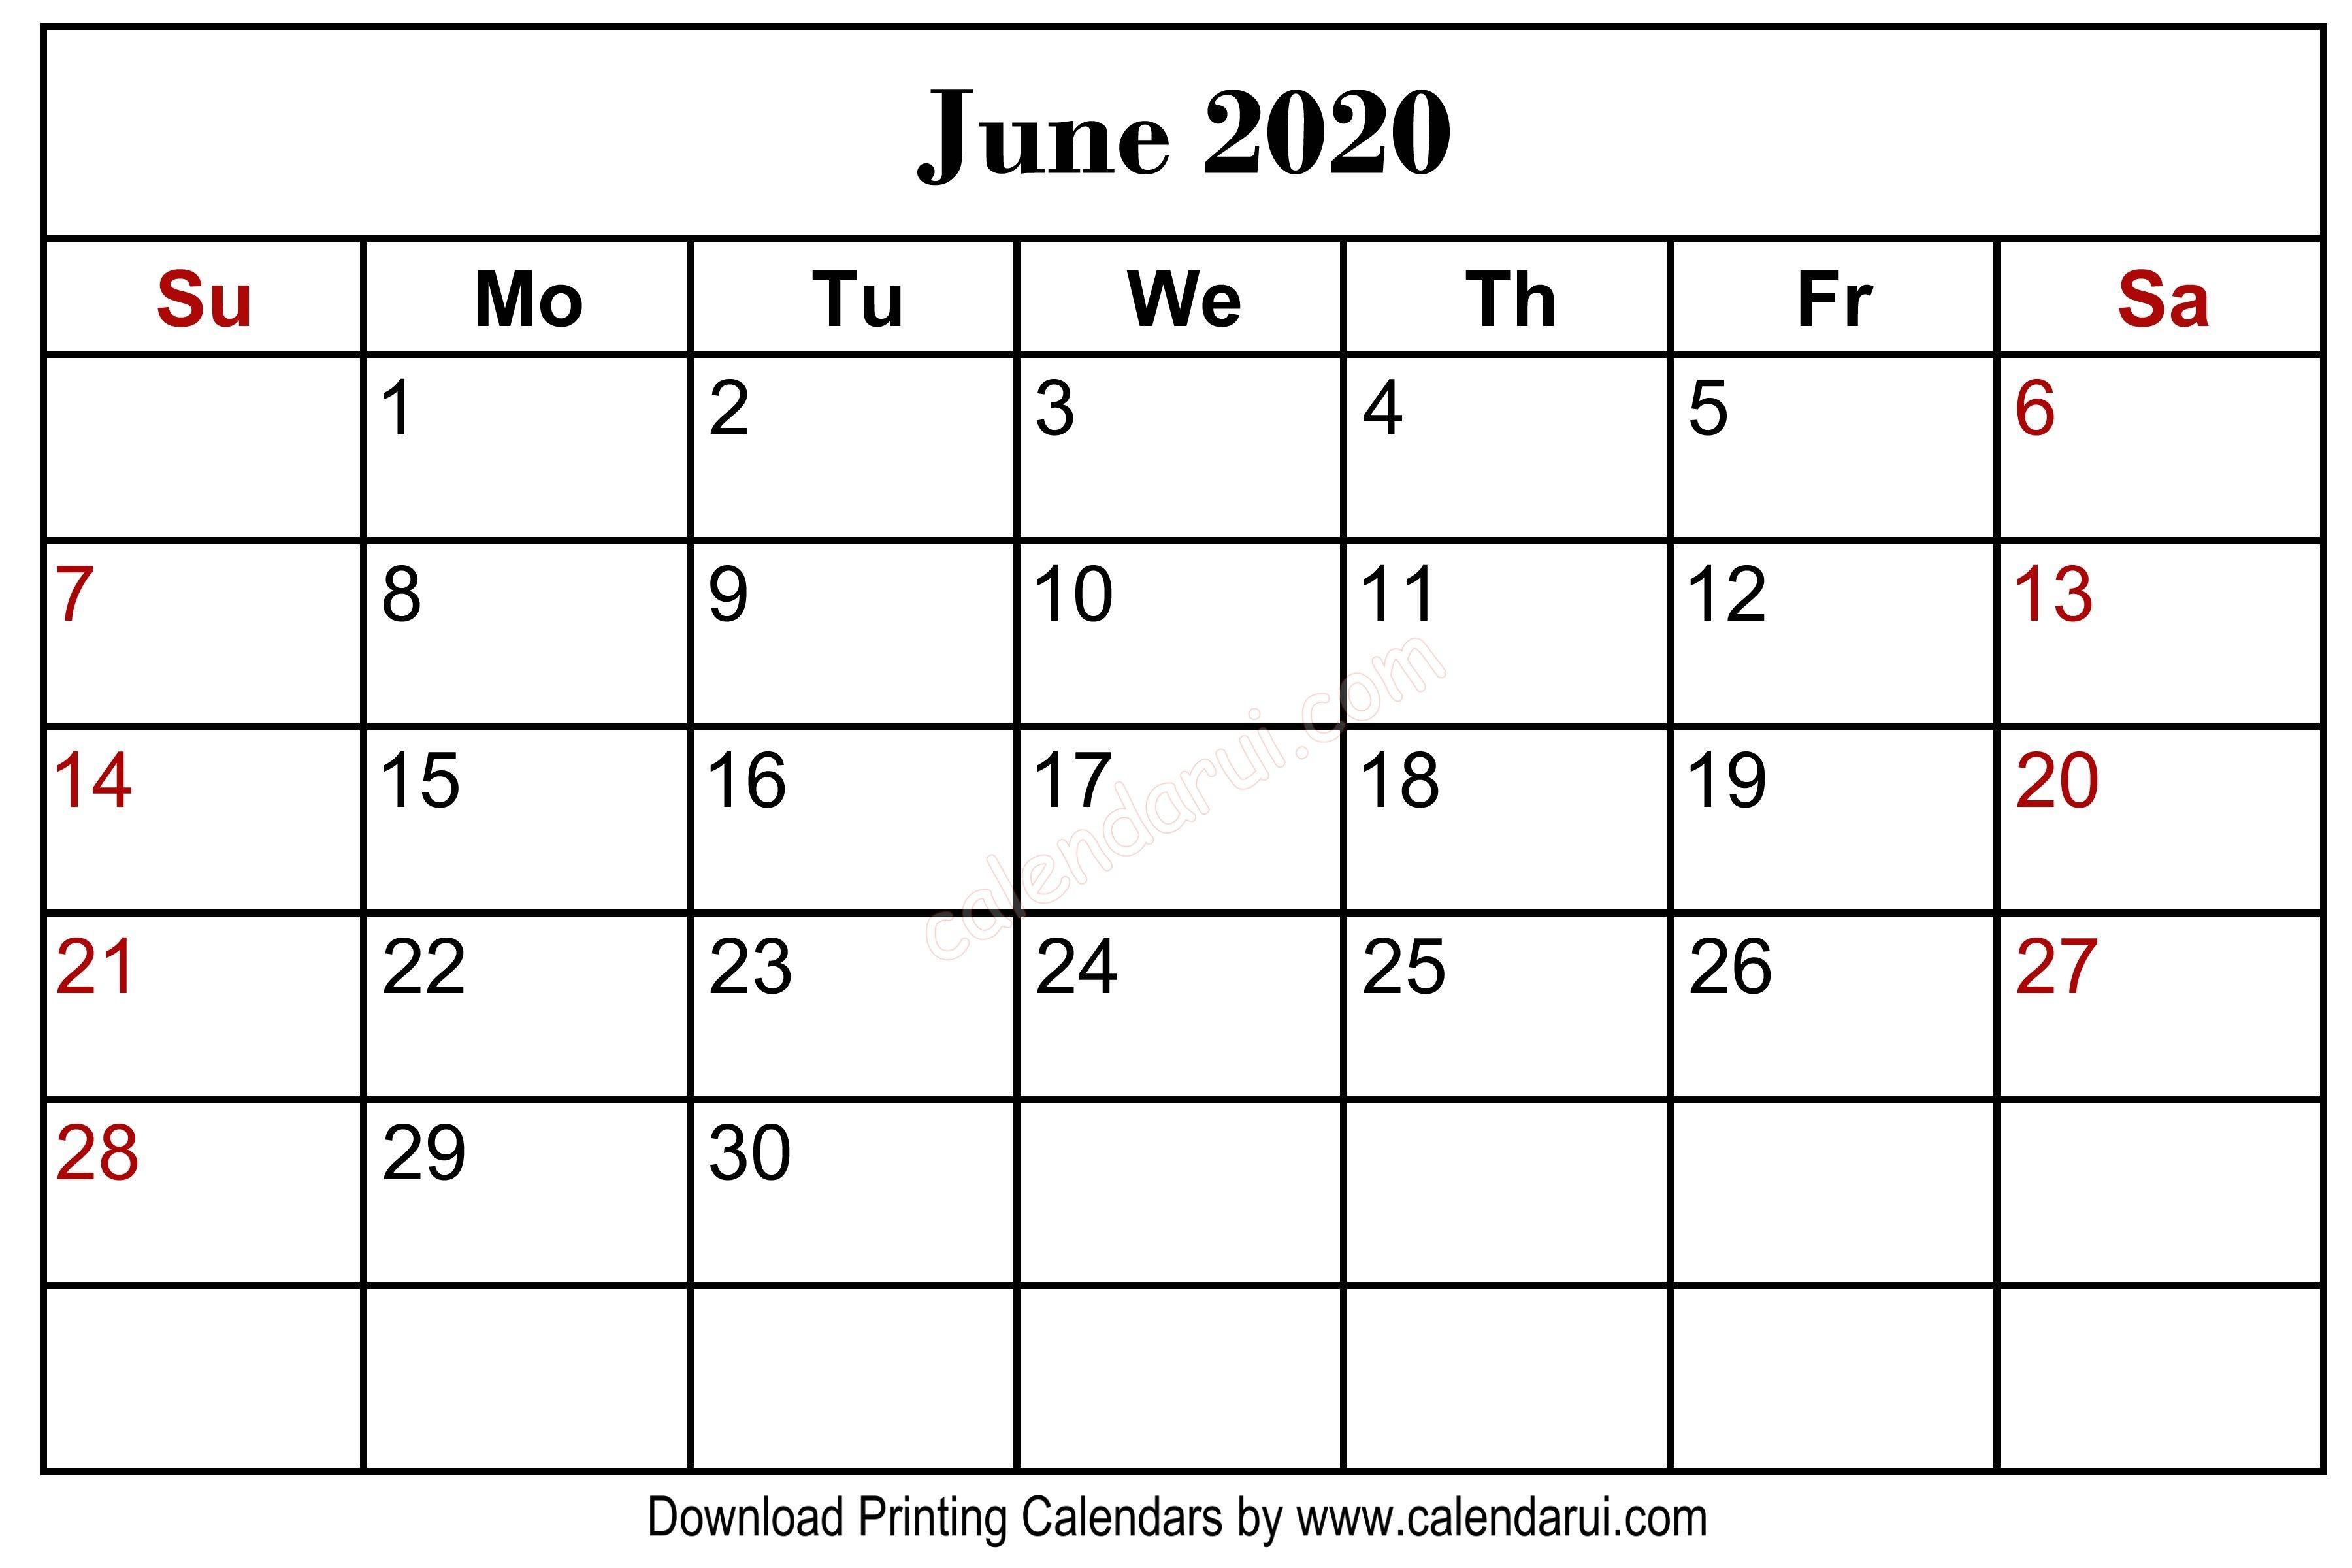 Printable Calendar with Holidays 2020 Homepage 2020 Calendar June 2020 Blank Calendar